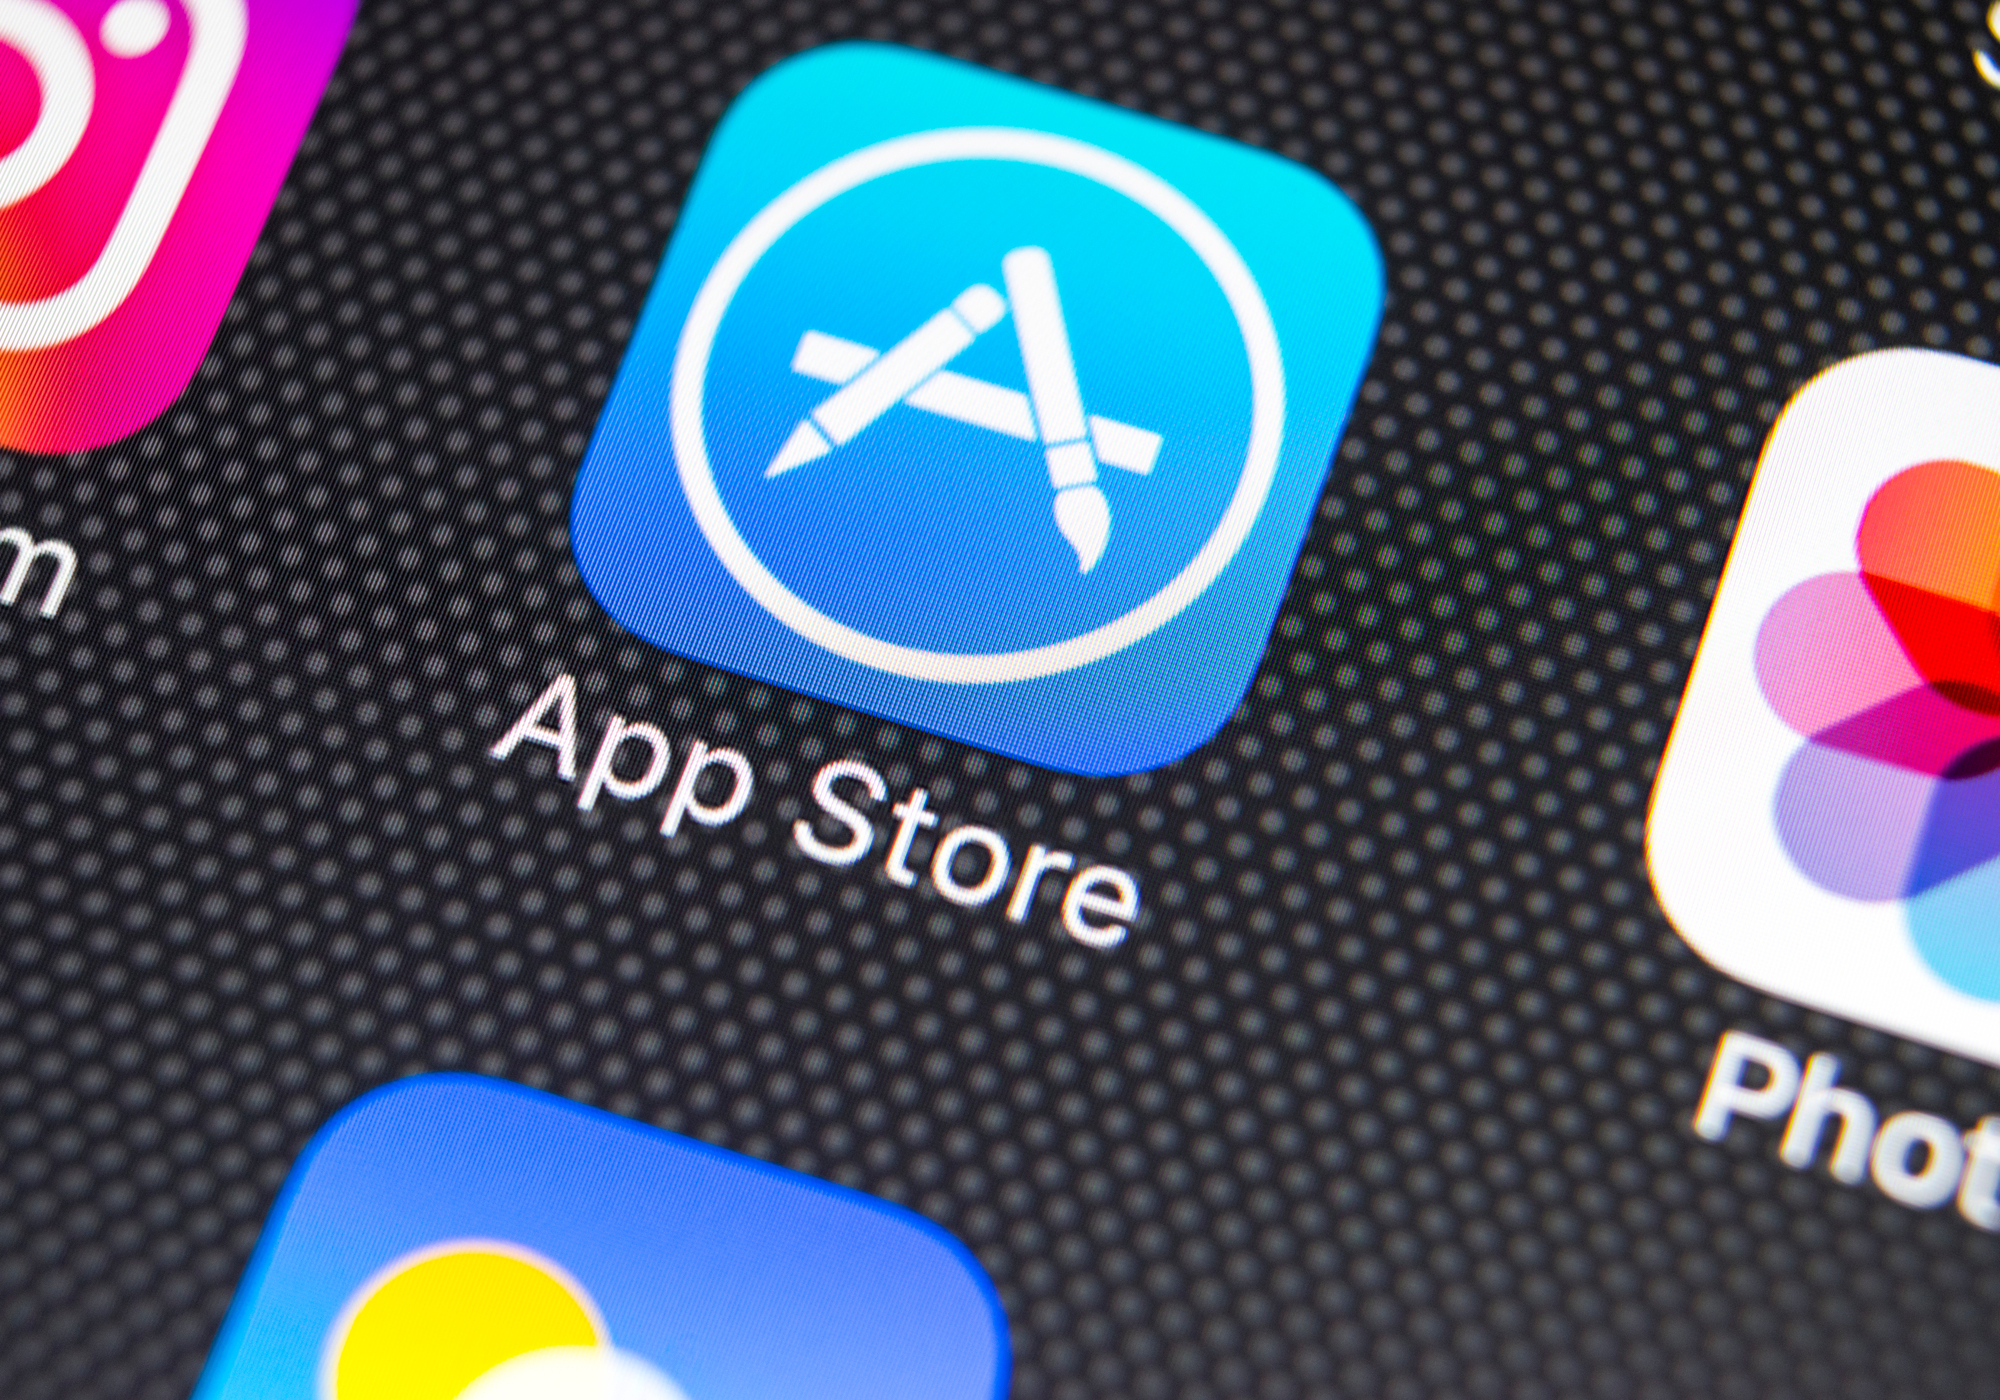 Apple faces EU antitrust probe over App Store practices